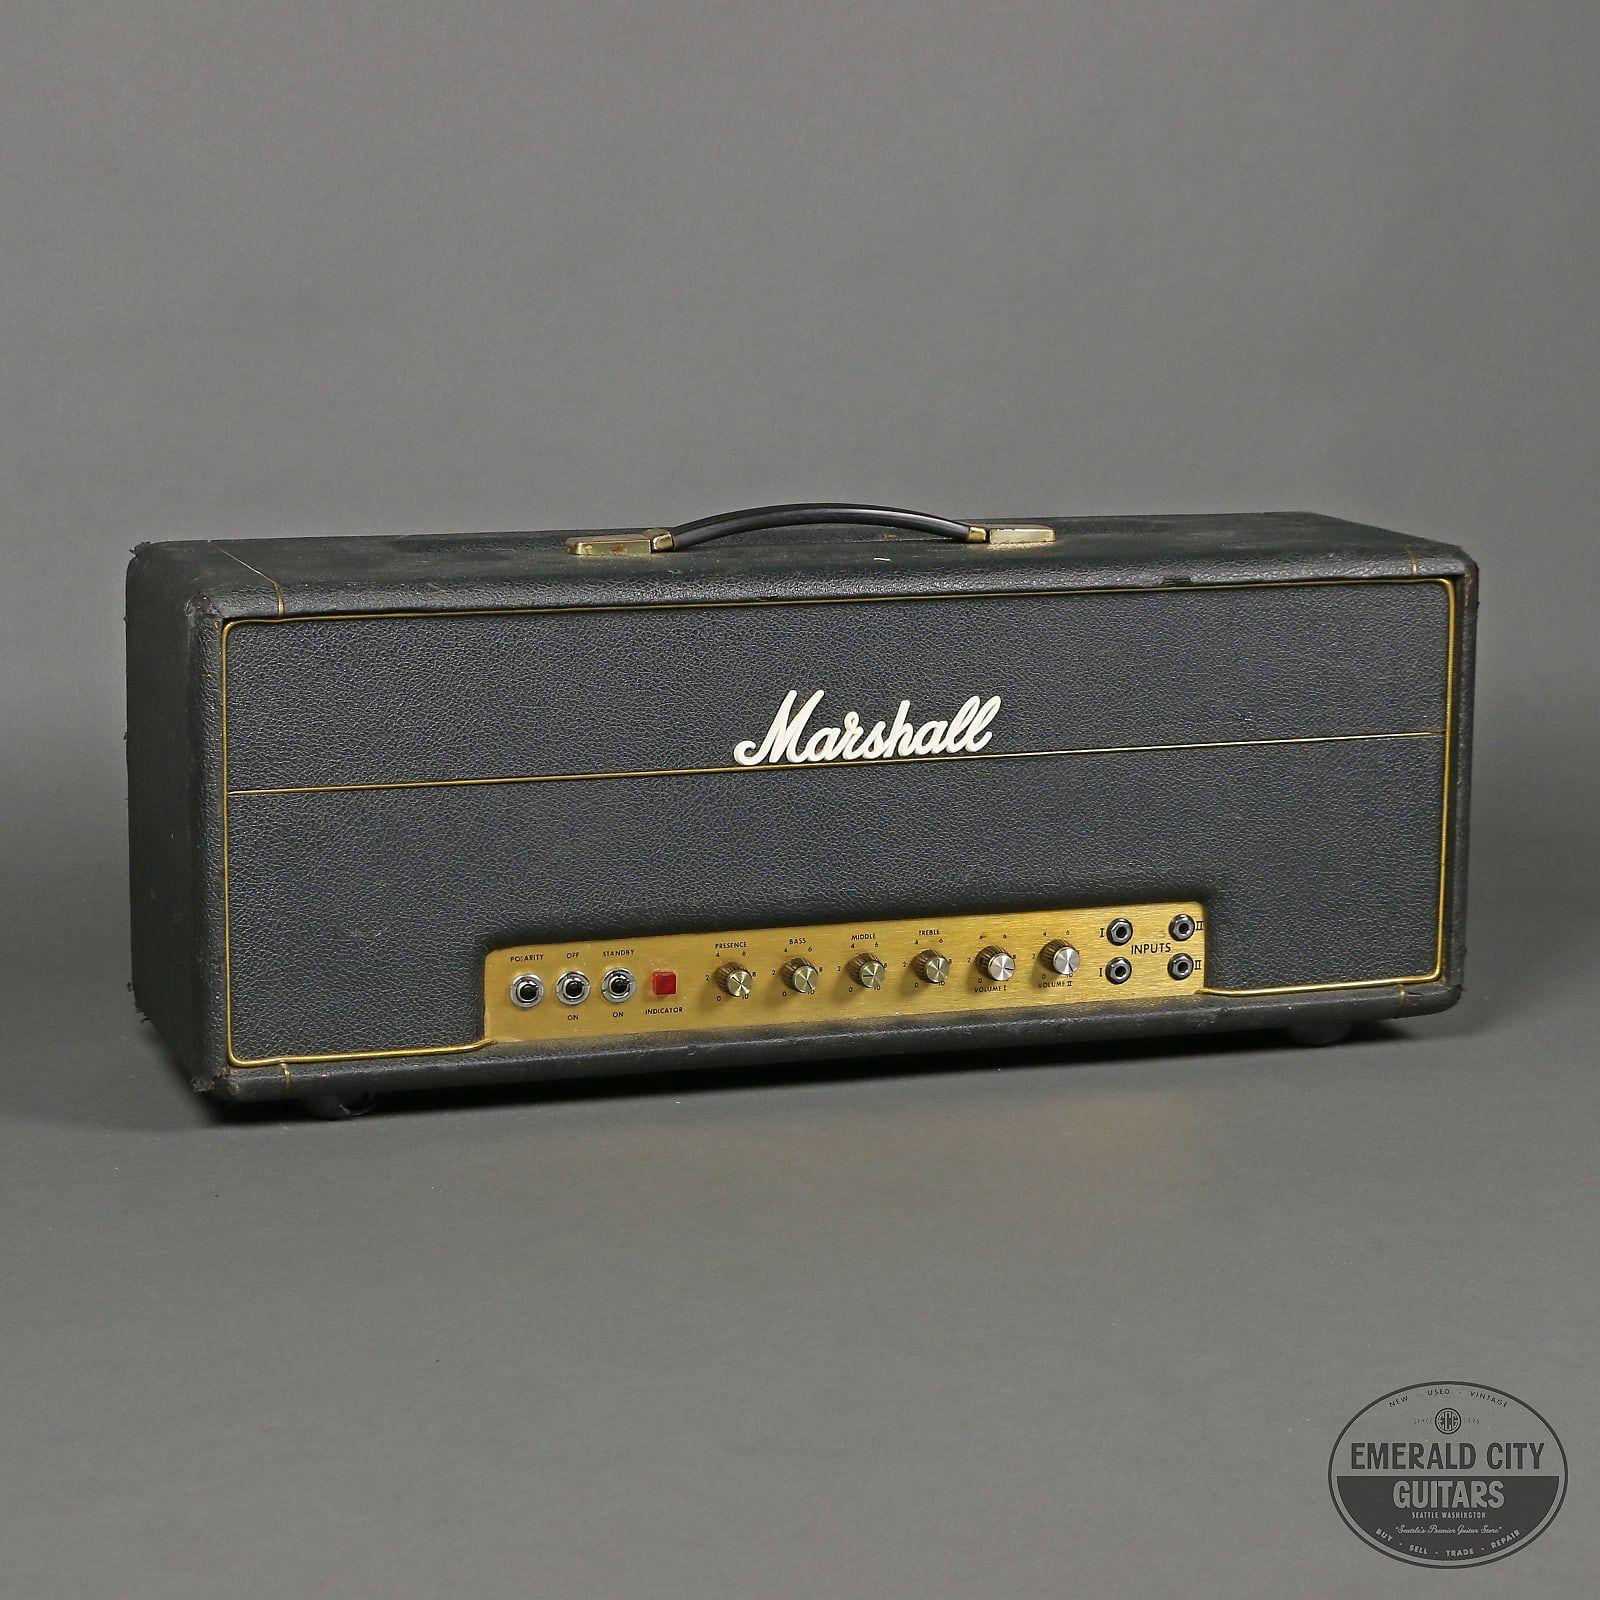 Marshall Jmp 1959 Super Lead 2 Channel 100 Watt Guitar Amp Head 1967 1975 Reverb In 2020 Marshall Amps Marshall Music Gear